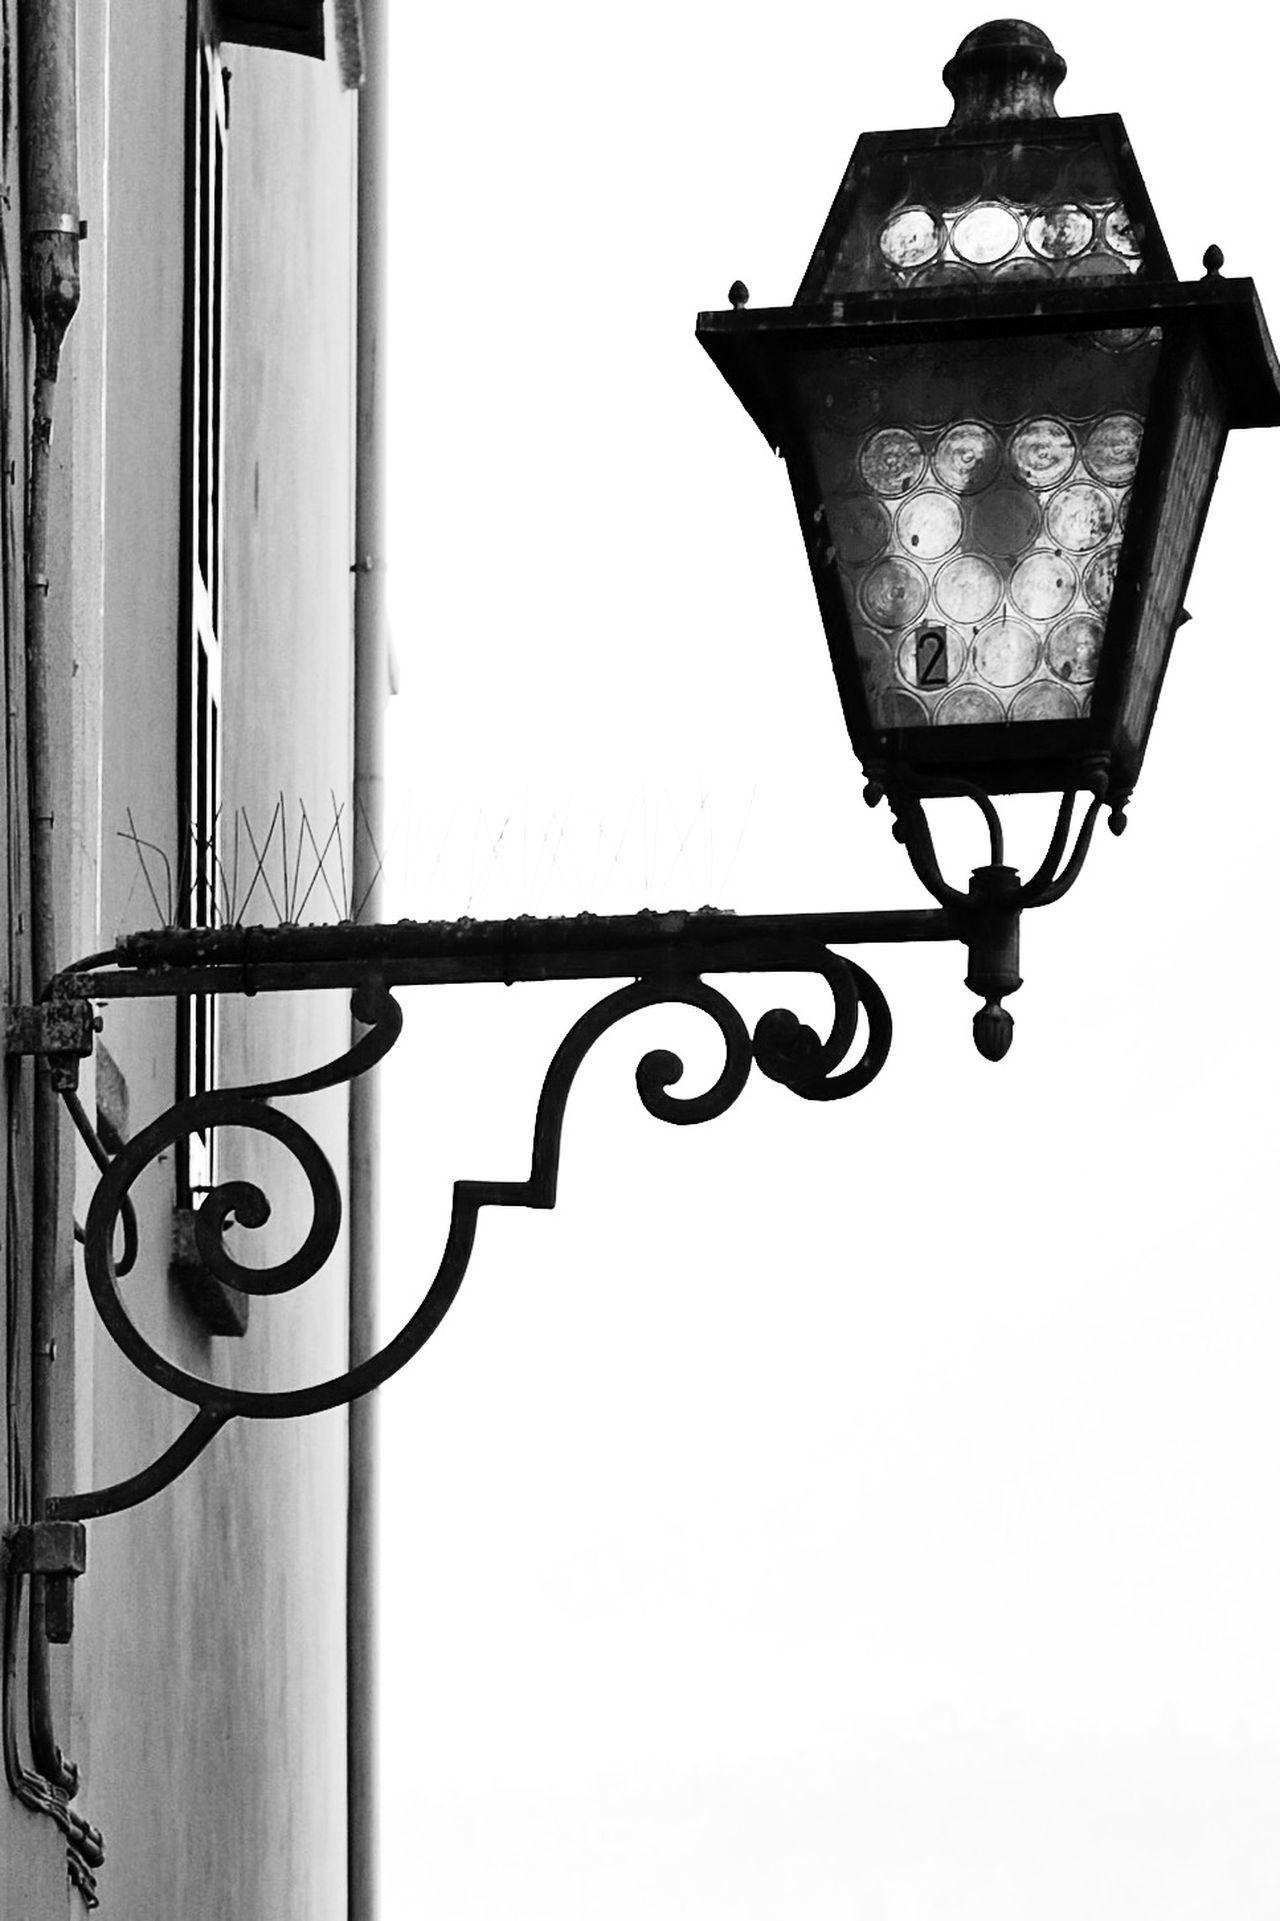 HighLight Italy Blackandwhite Brickwalllights Blackandwhite Photography EyeEmBestEdits EyeEm Best Shots Black&white Streetlights Architecture